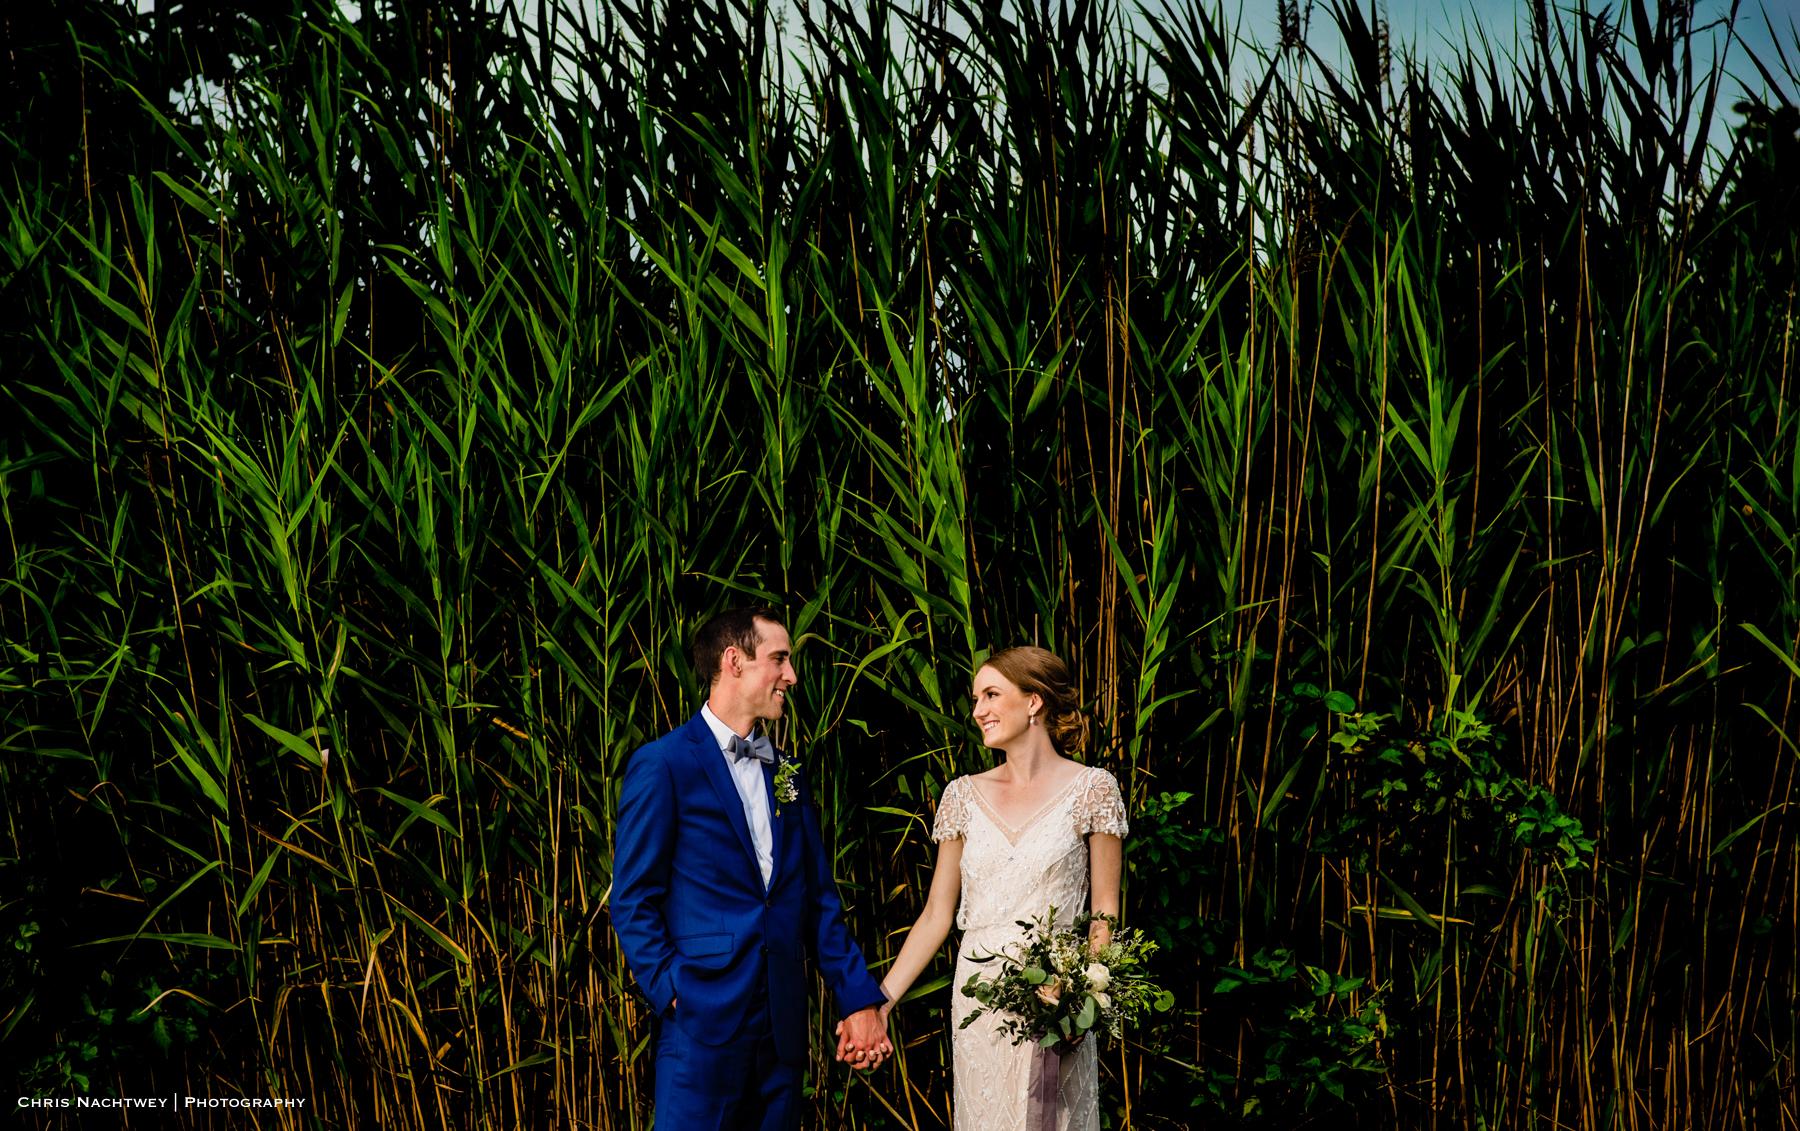 photos-wedding-quidnessett-country-club-ri-chris-nachtwey-photography-2018-37.jpg